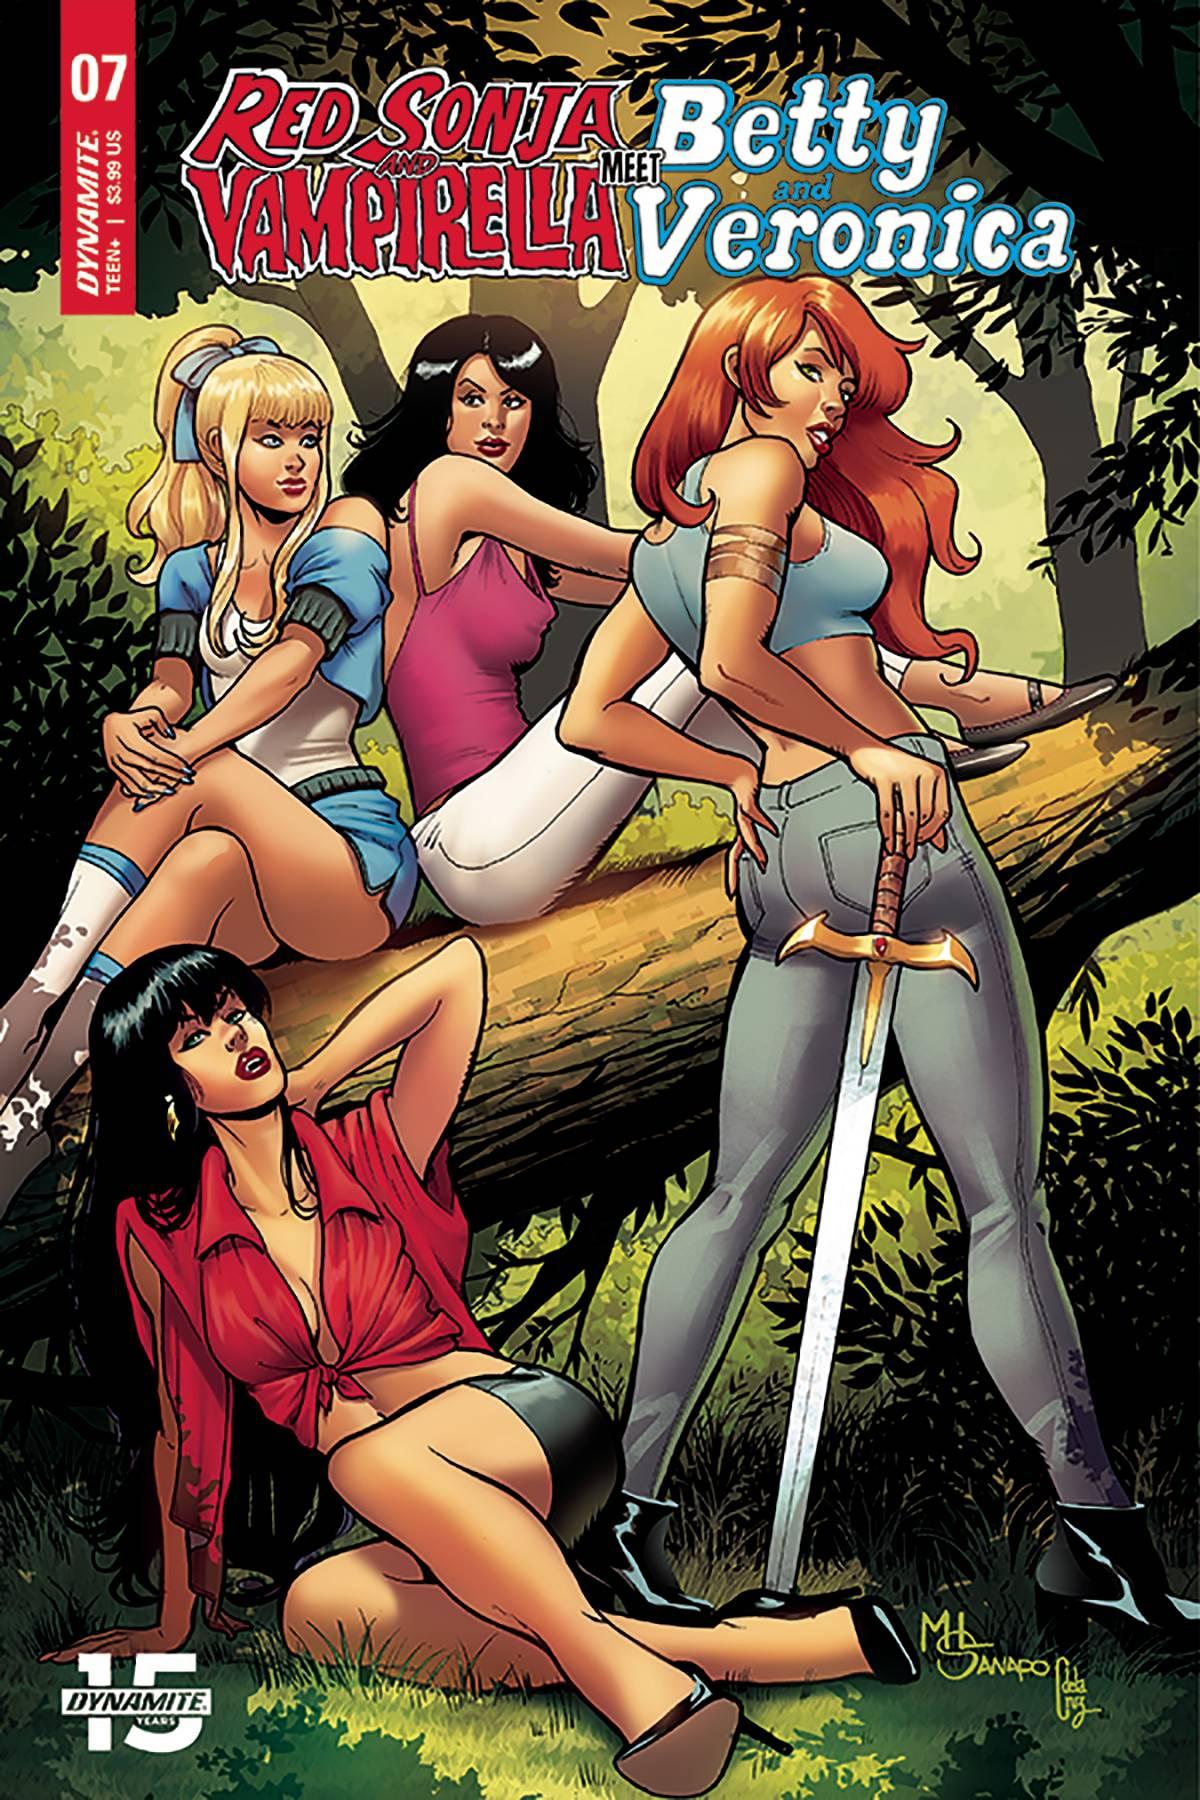 Red Sonja Vampirella Betty Veronica #7 Cover B VF Vault 35 2019 Dynamite